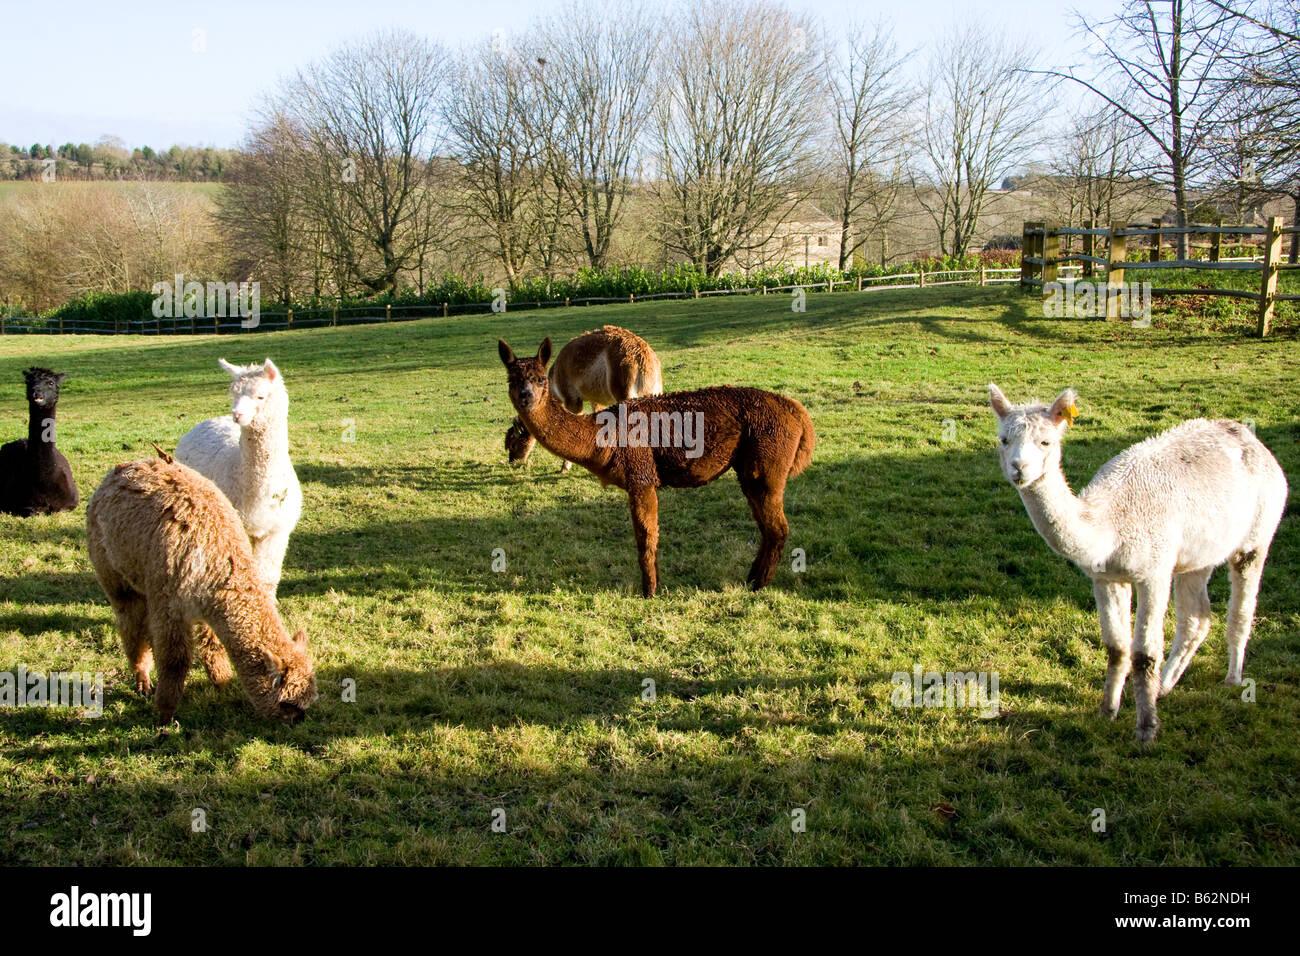 Alpaca Lama pacos gazing green grass for wool clothing in Cotswold Bibury England UK - Stock Image